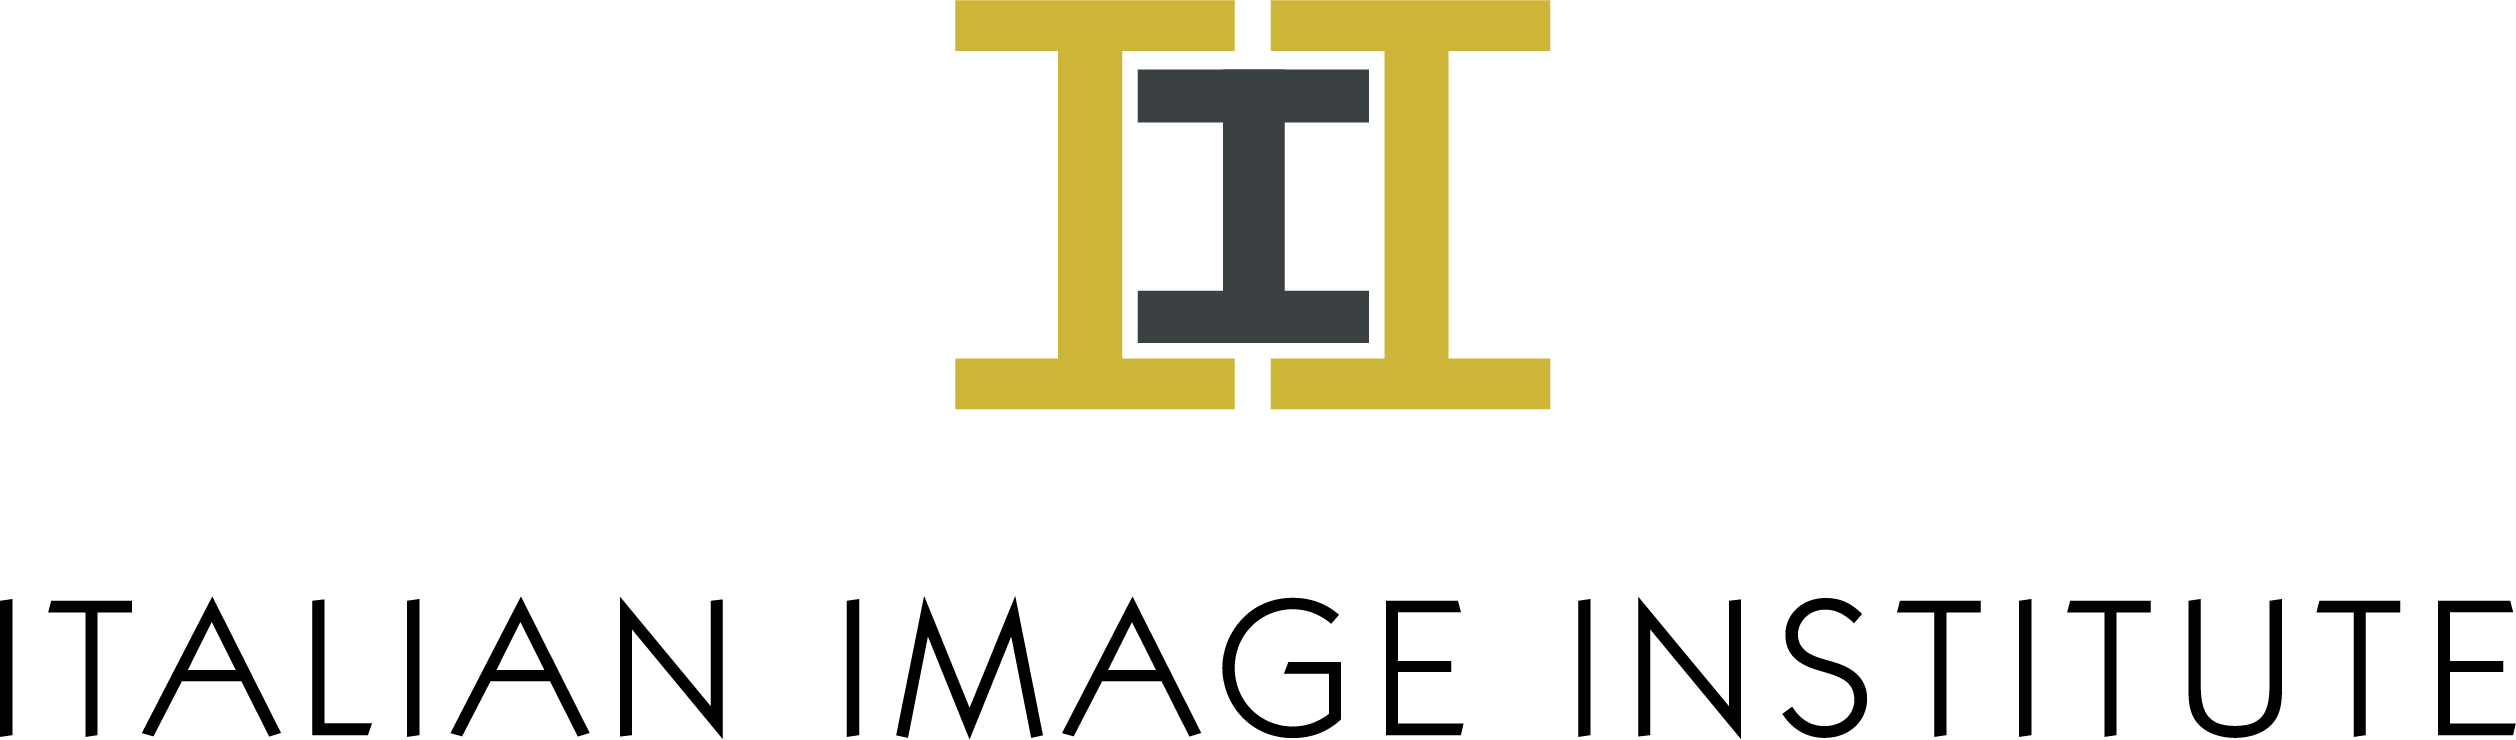 logo-sfondo-Italian-Image-Institute-1